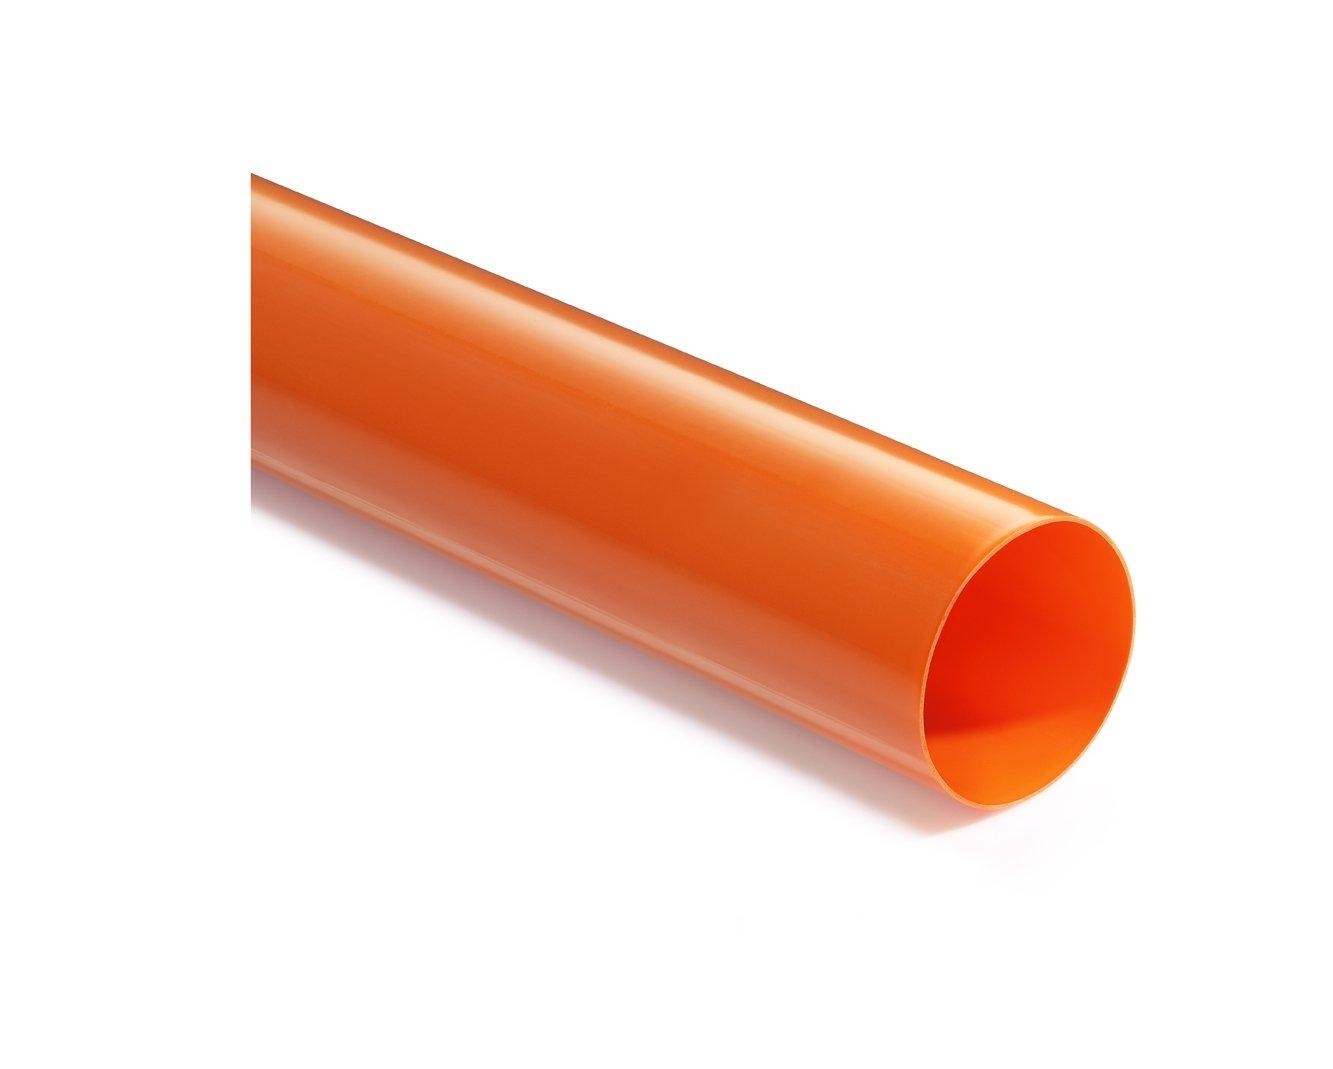 5 x 12 Clear 5//8 Diameter Polyvinyl Chloride Insultab 30-VGA-0625C-P1 Vinylguard Shrink-To-Fit Covering